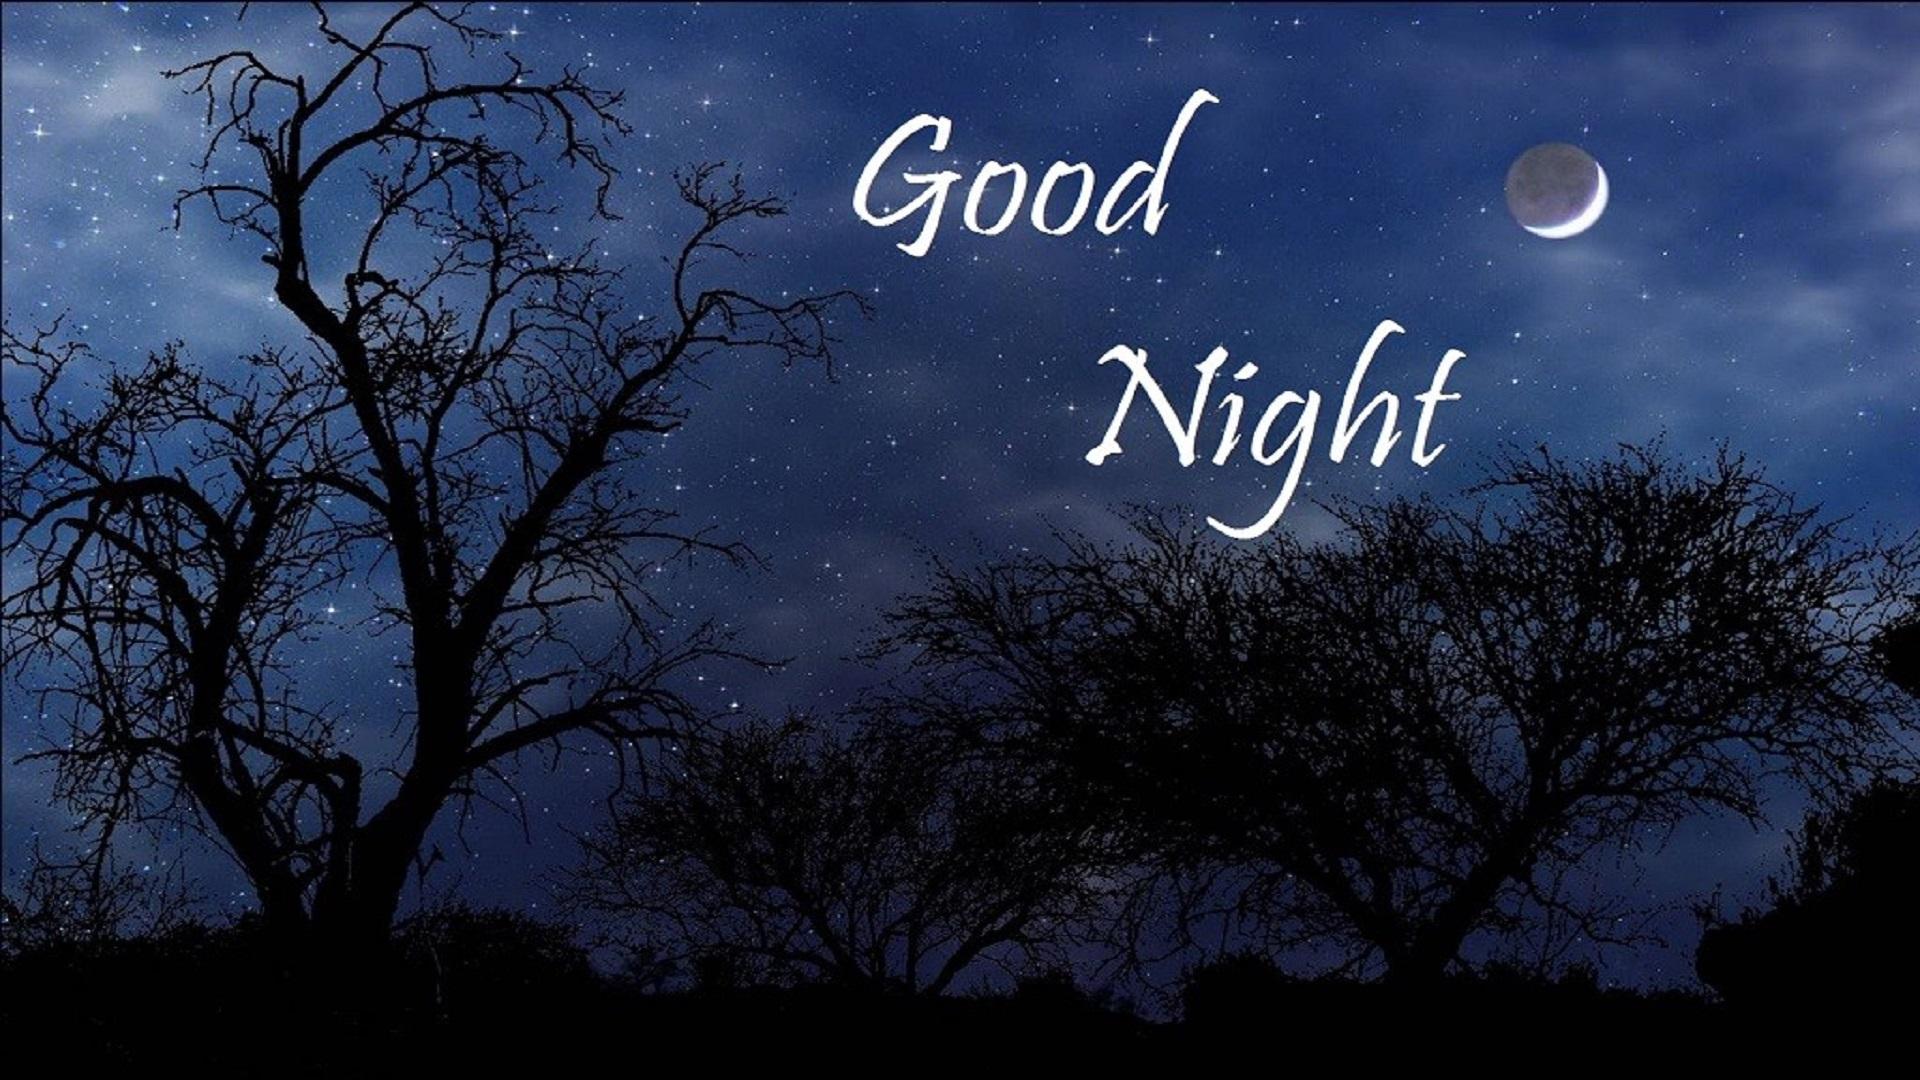 Good Night Sweet Dream Images Wallpapers Hd   Good Night Sad 1920x1080